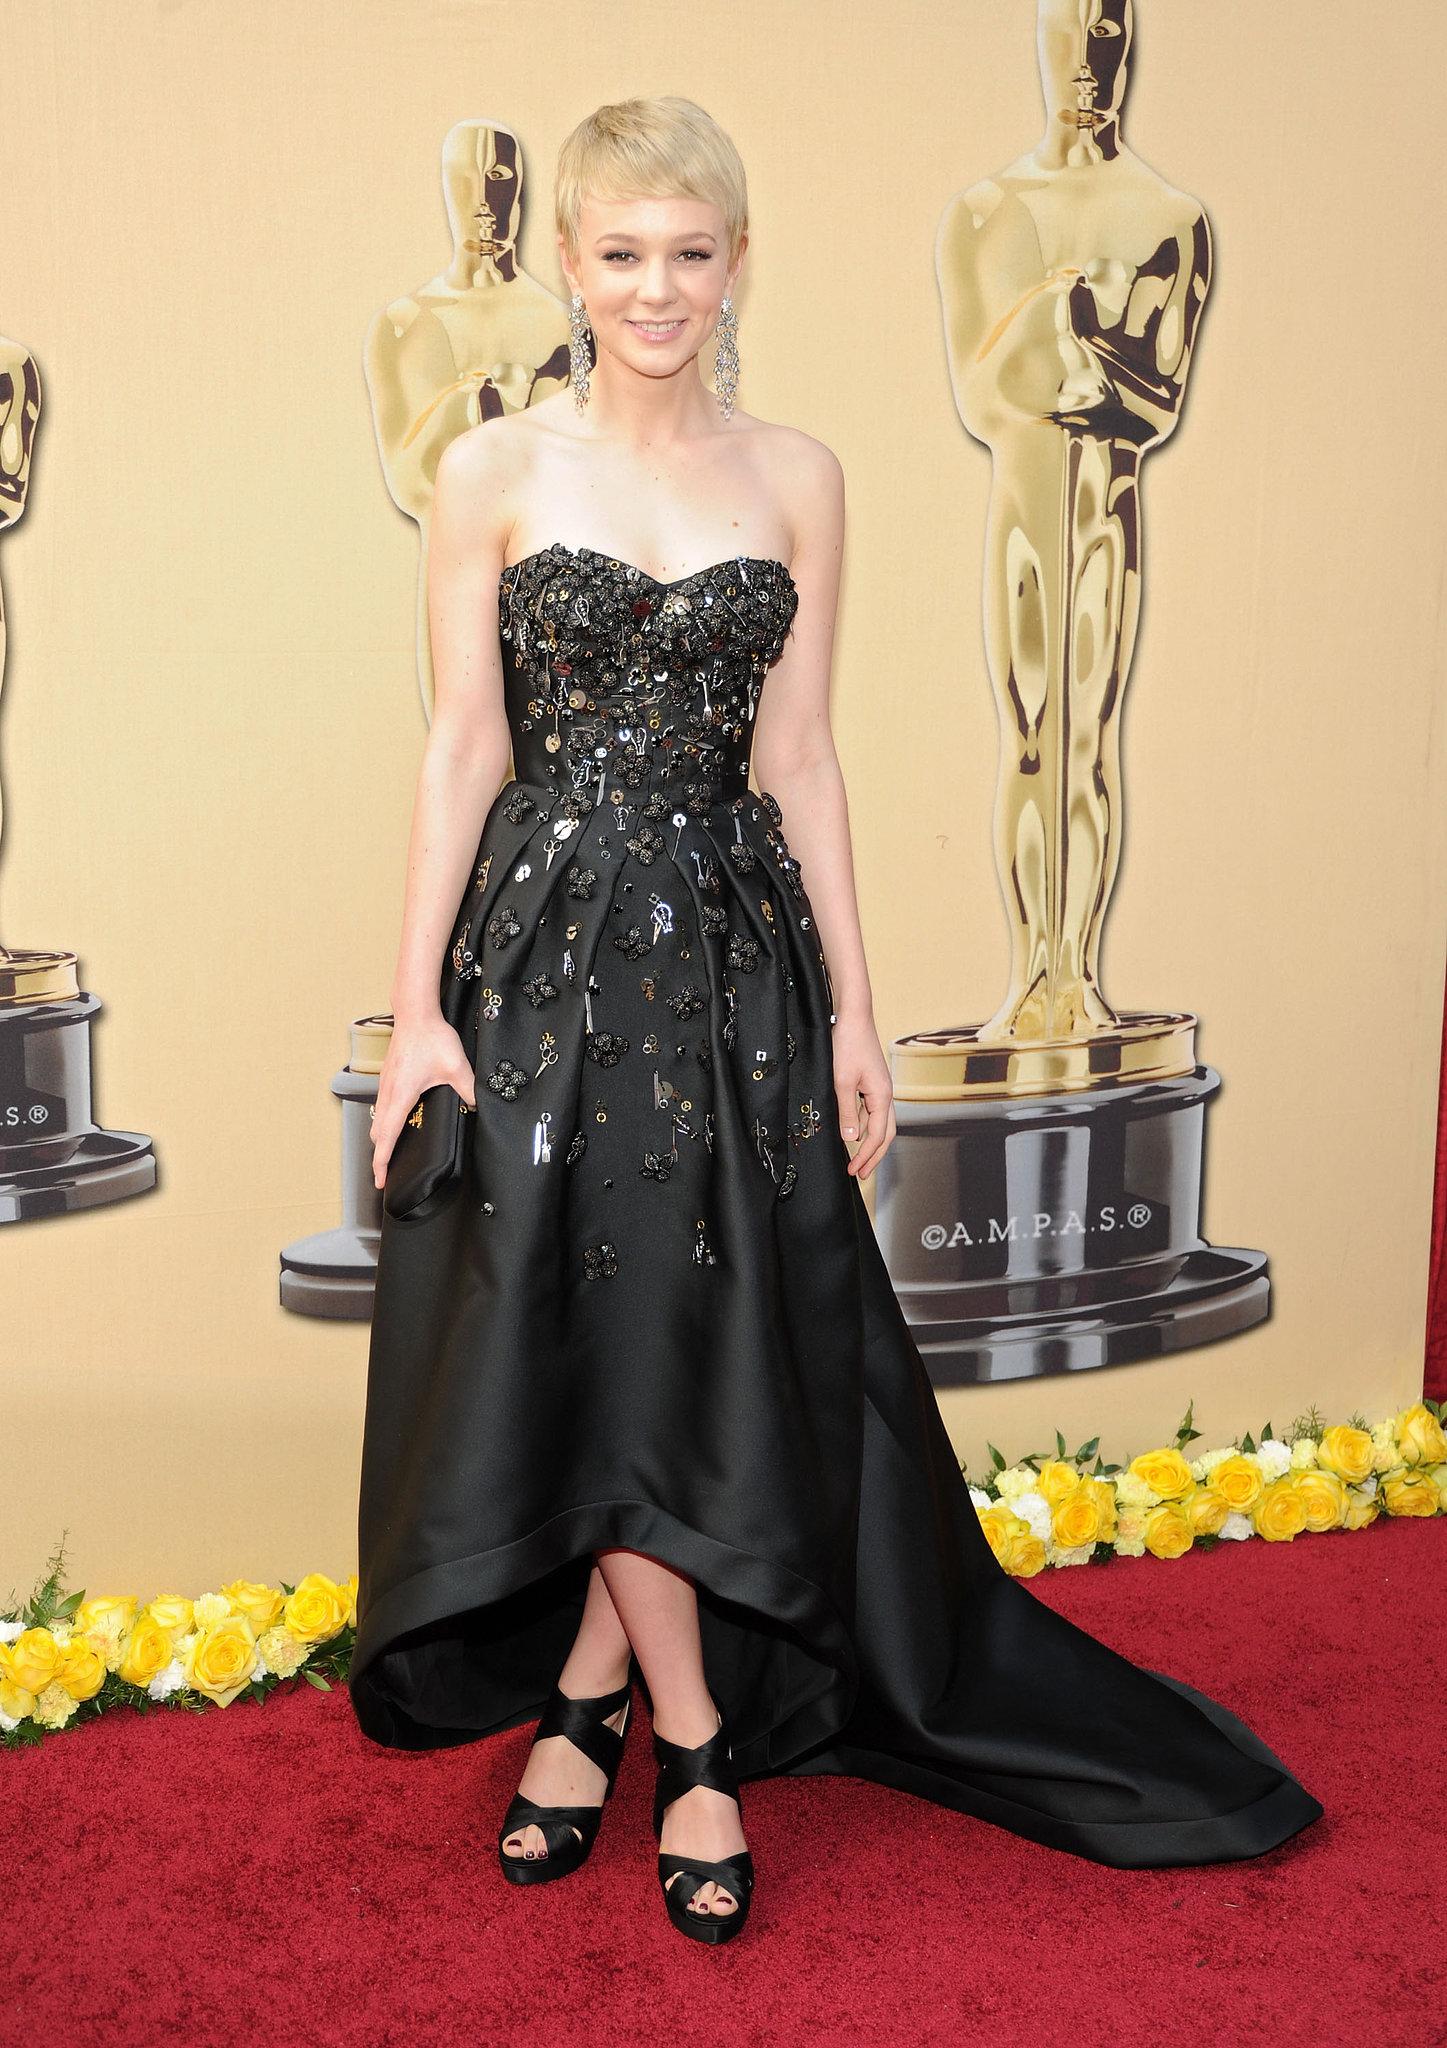 Carey Mulligan in a Prada Gown at the 2010 Oscars